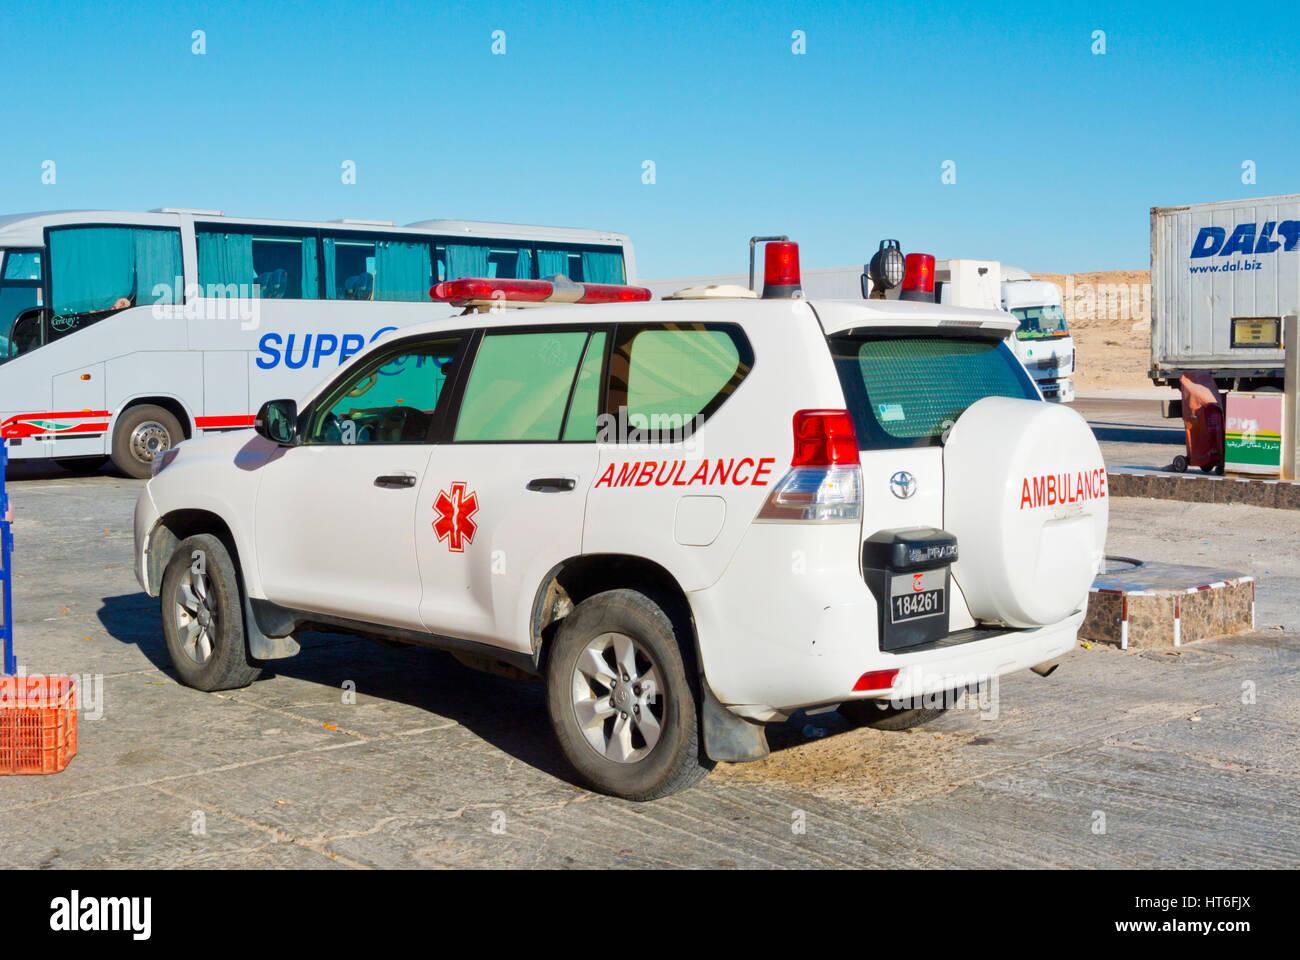 SUV ambulance, Petrom Sahara service station, N1 road, between Boujdour and Dakhla, Western Sahara, administered - Stock Image